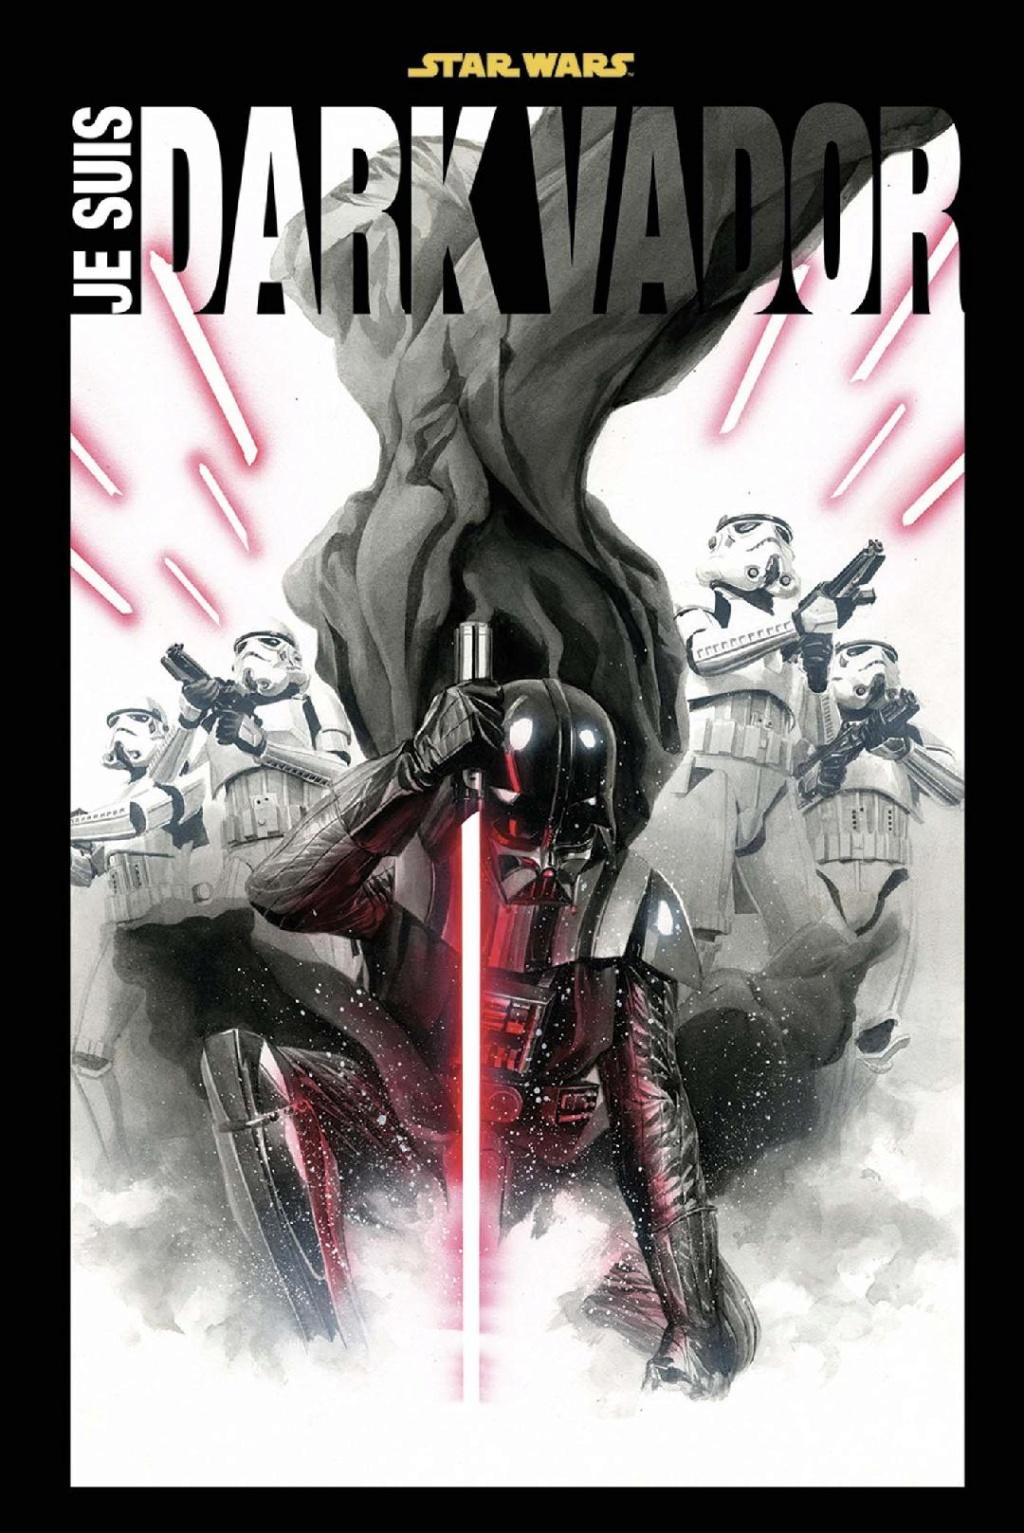 JE SUIS DARK VADOR - PANINI - Star Wars Anthologie Je_sui10